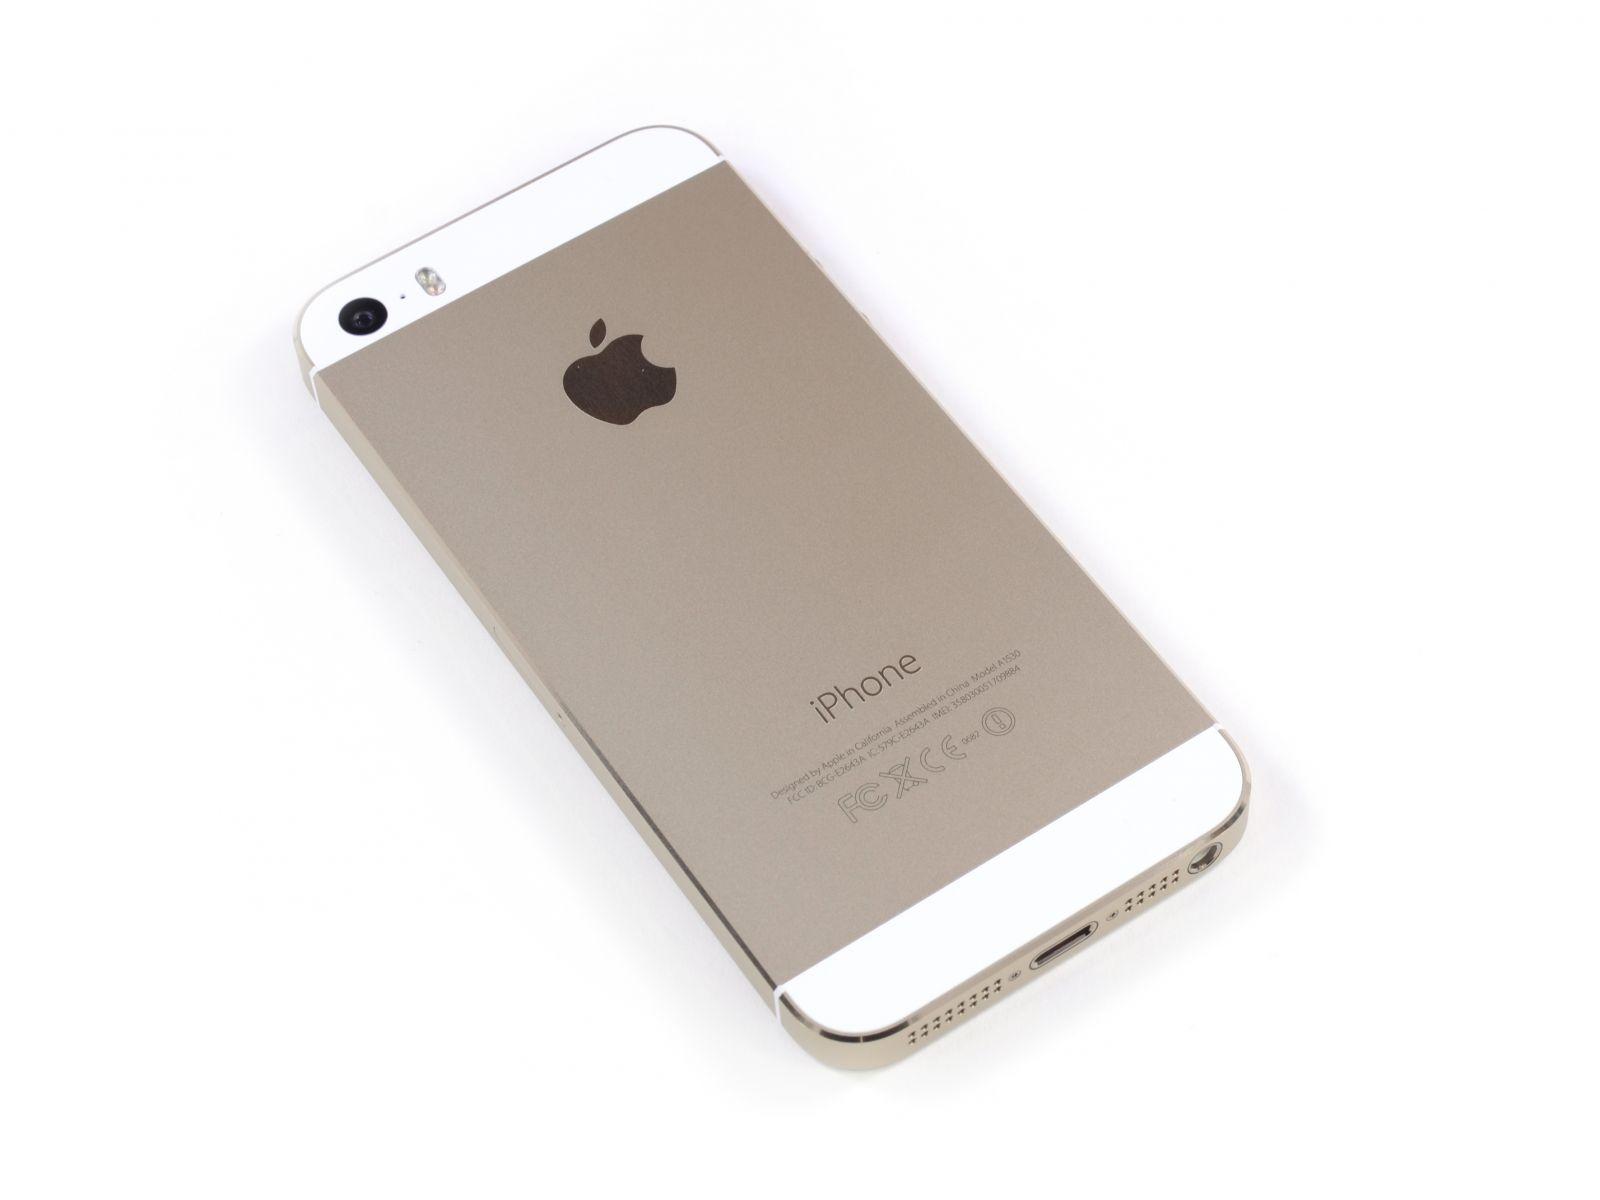 kak-razobrat-iphone-5s-06